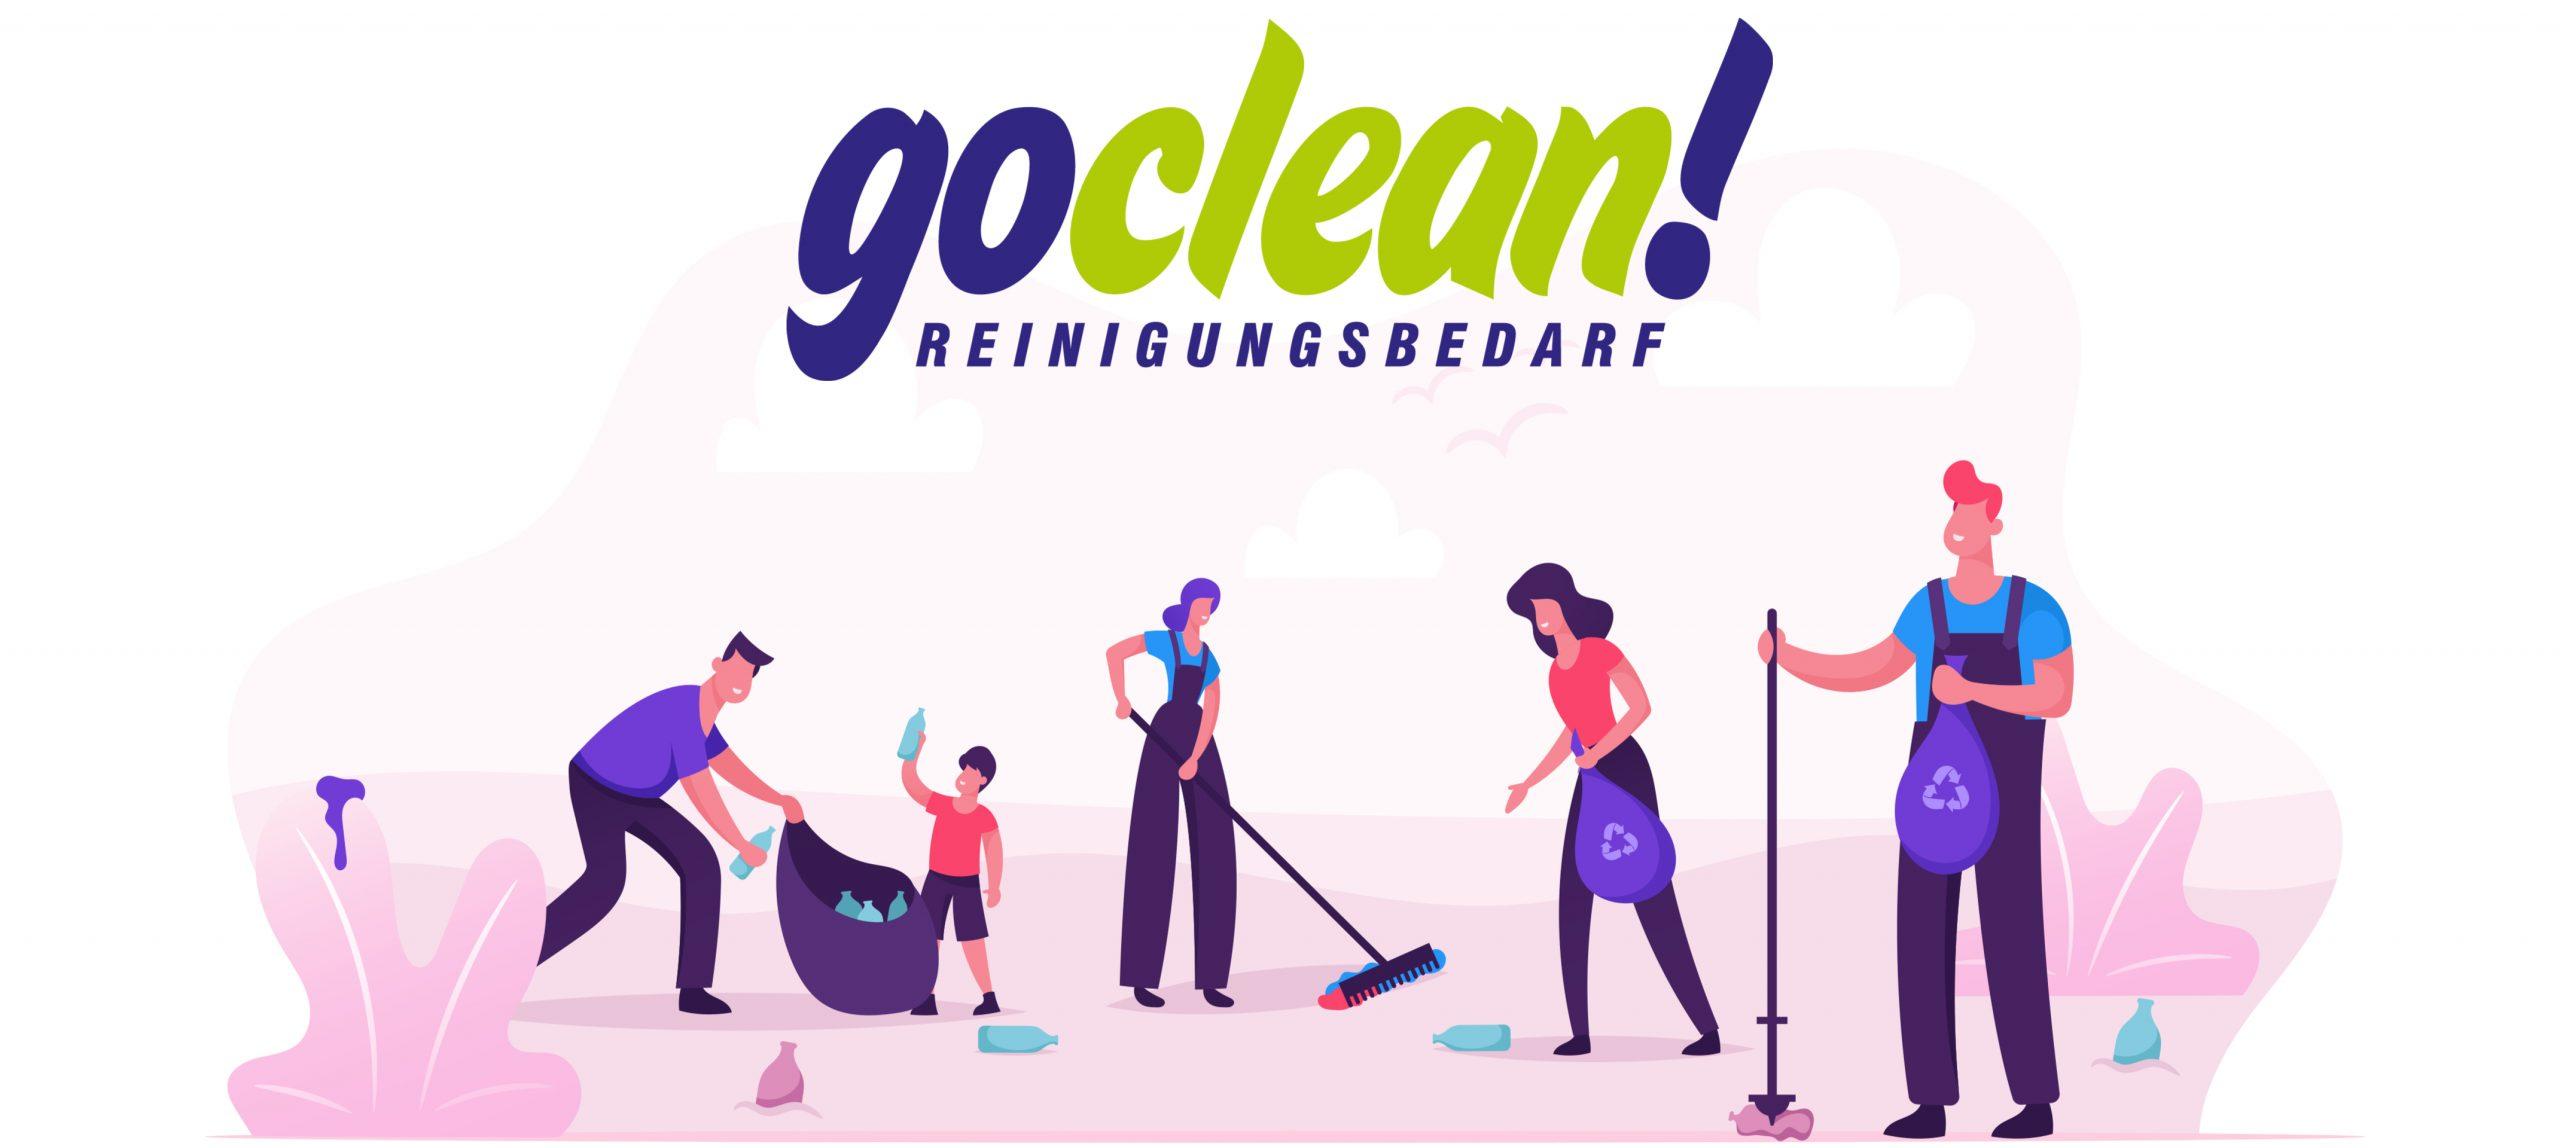 go clean! GmbH - Reinigungsbedarf